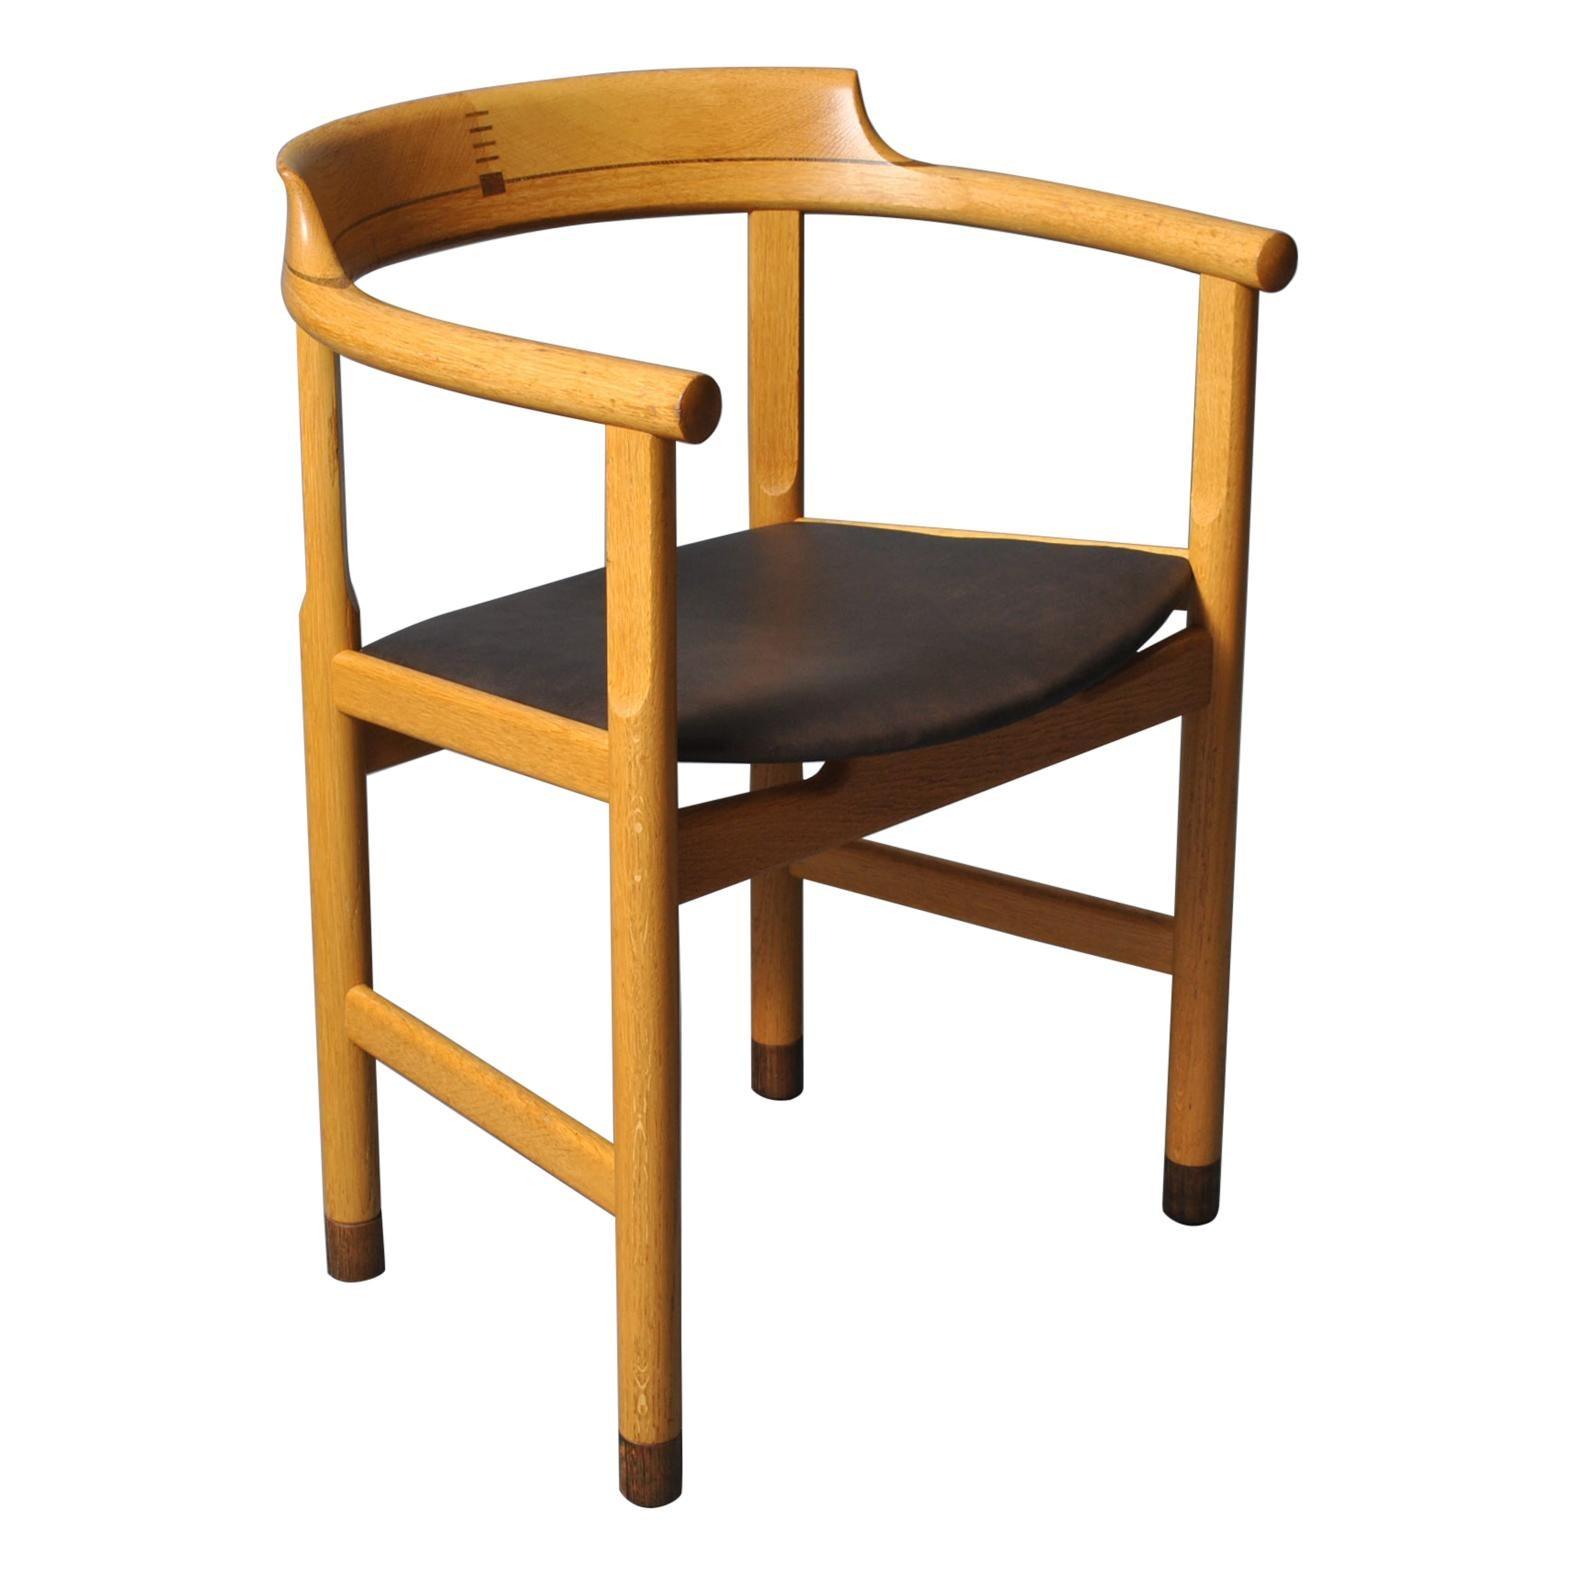 Original Hans J Wegner PP52 Chairs